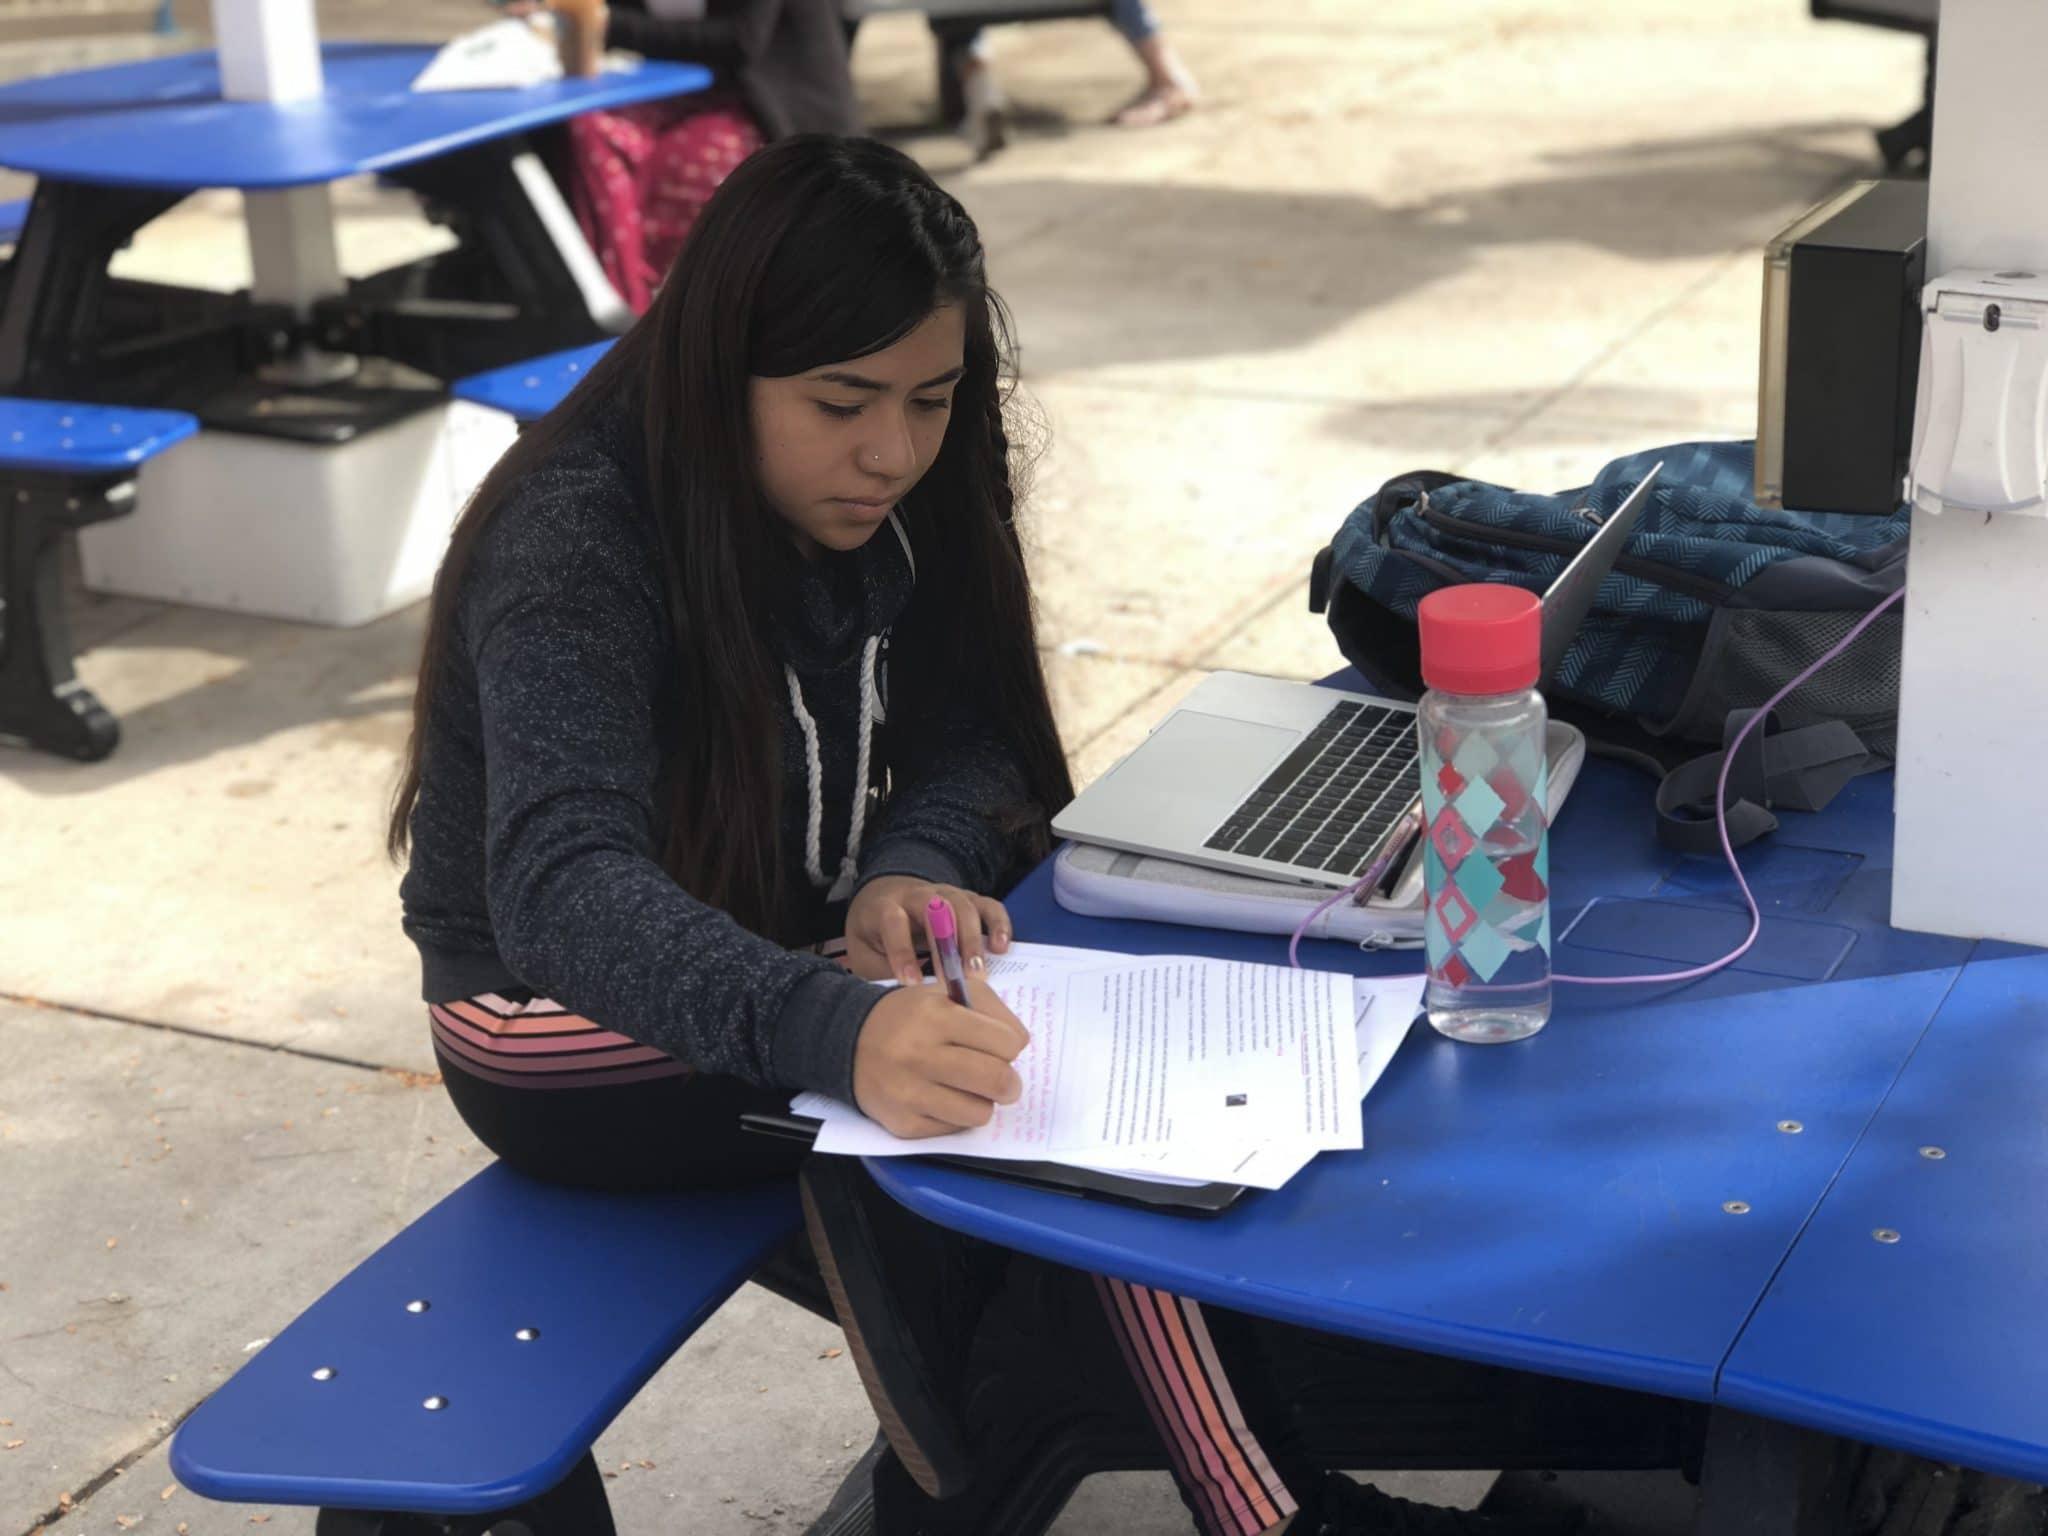 Carla Ordaz, student at the University of Colorado, Denver. Photo by Taylor Sienkiewicz.